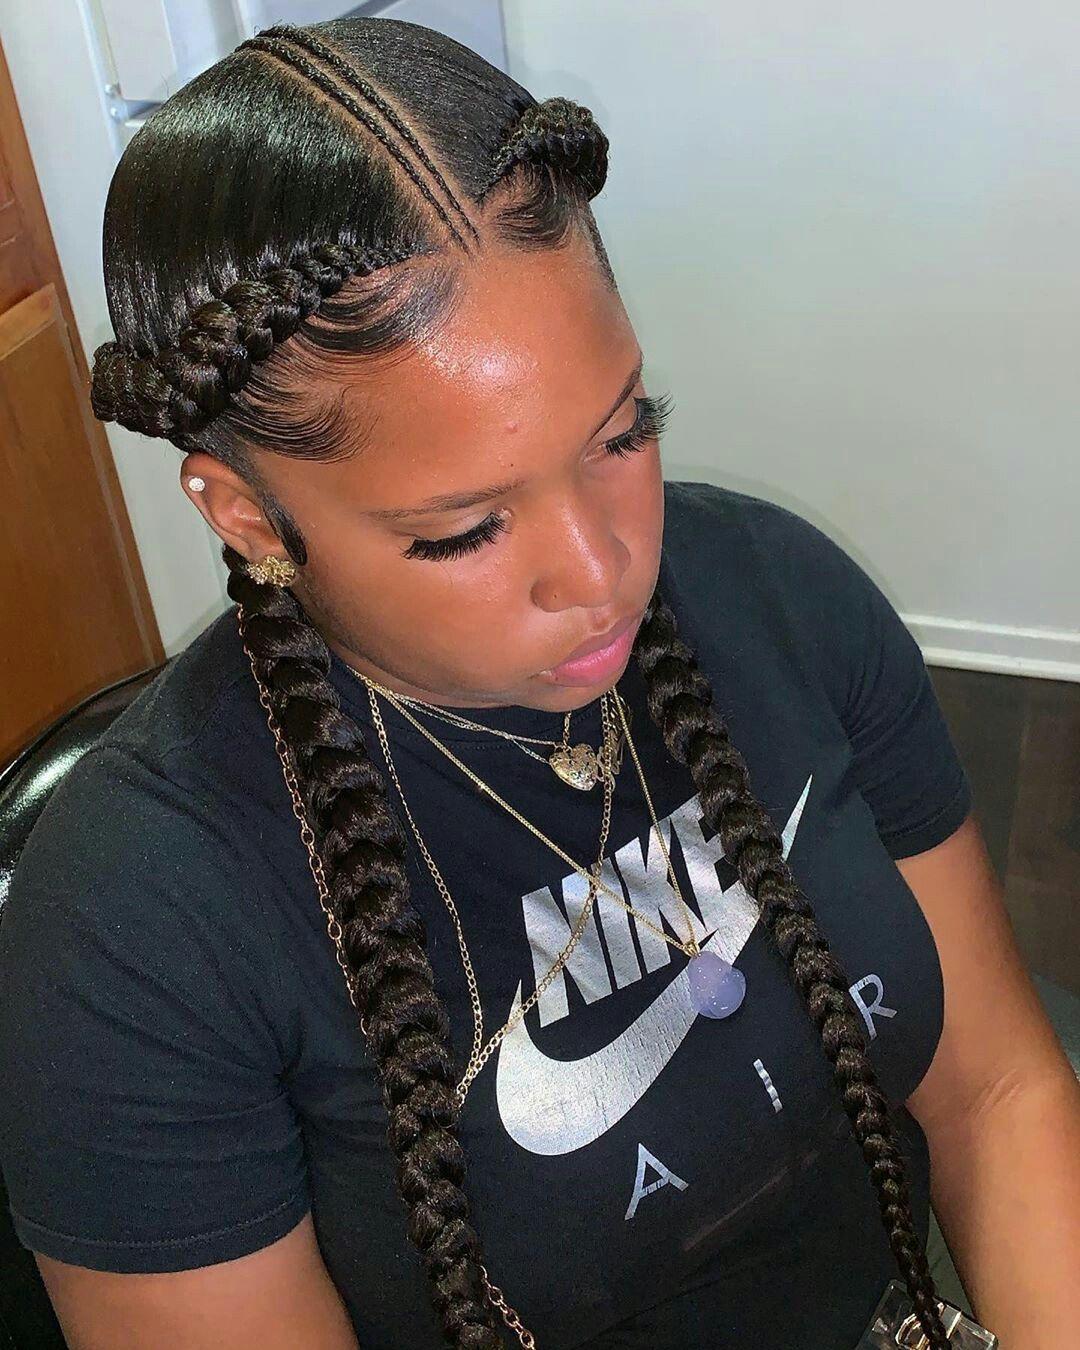 Follow Miahpapayaaa For More Pins Two Braid Hairstyles Goddess Braids Hairstyles Feed In Braids Hairstyles